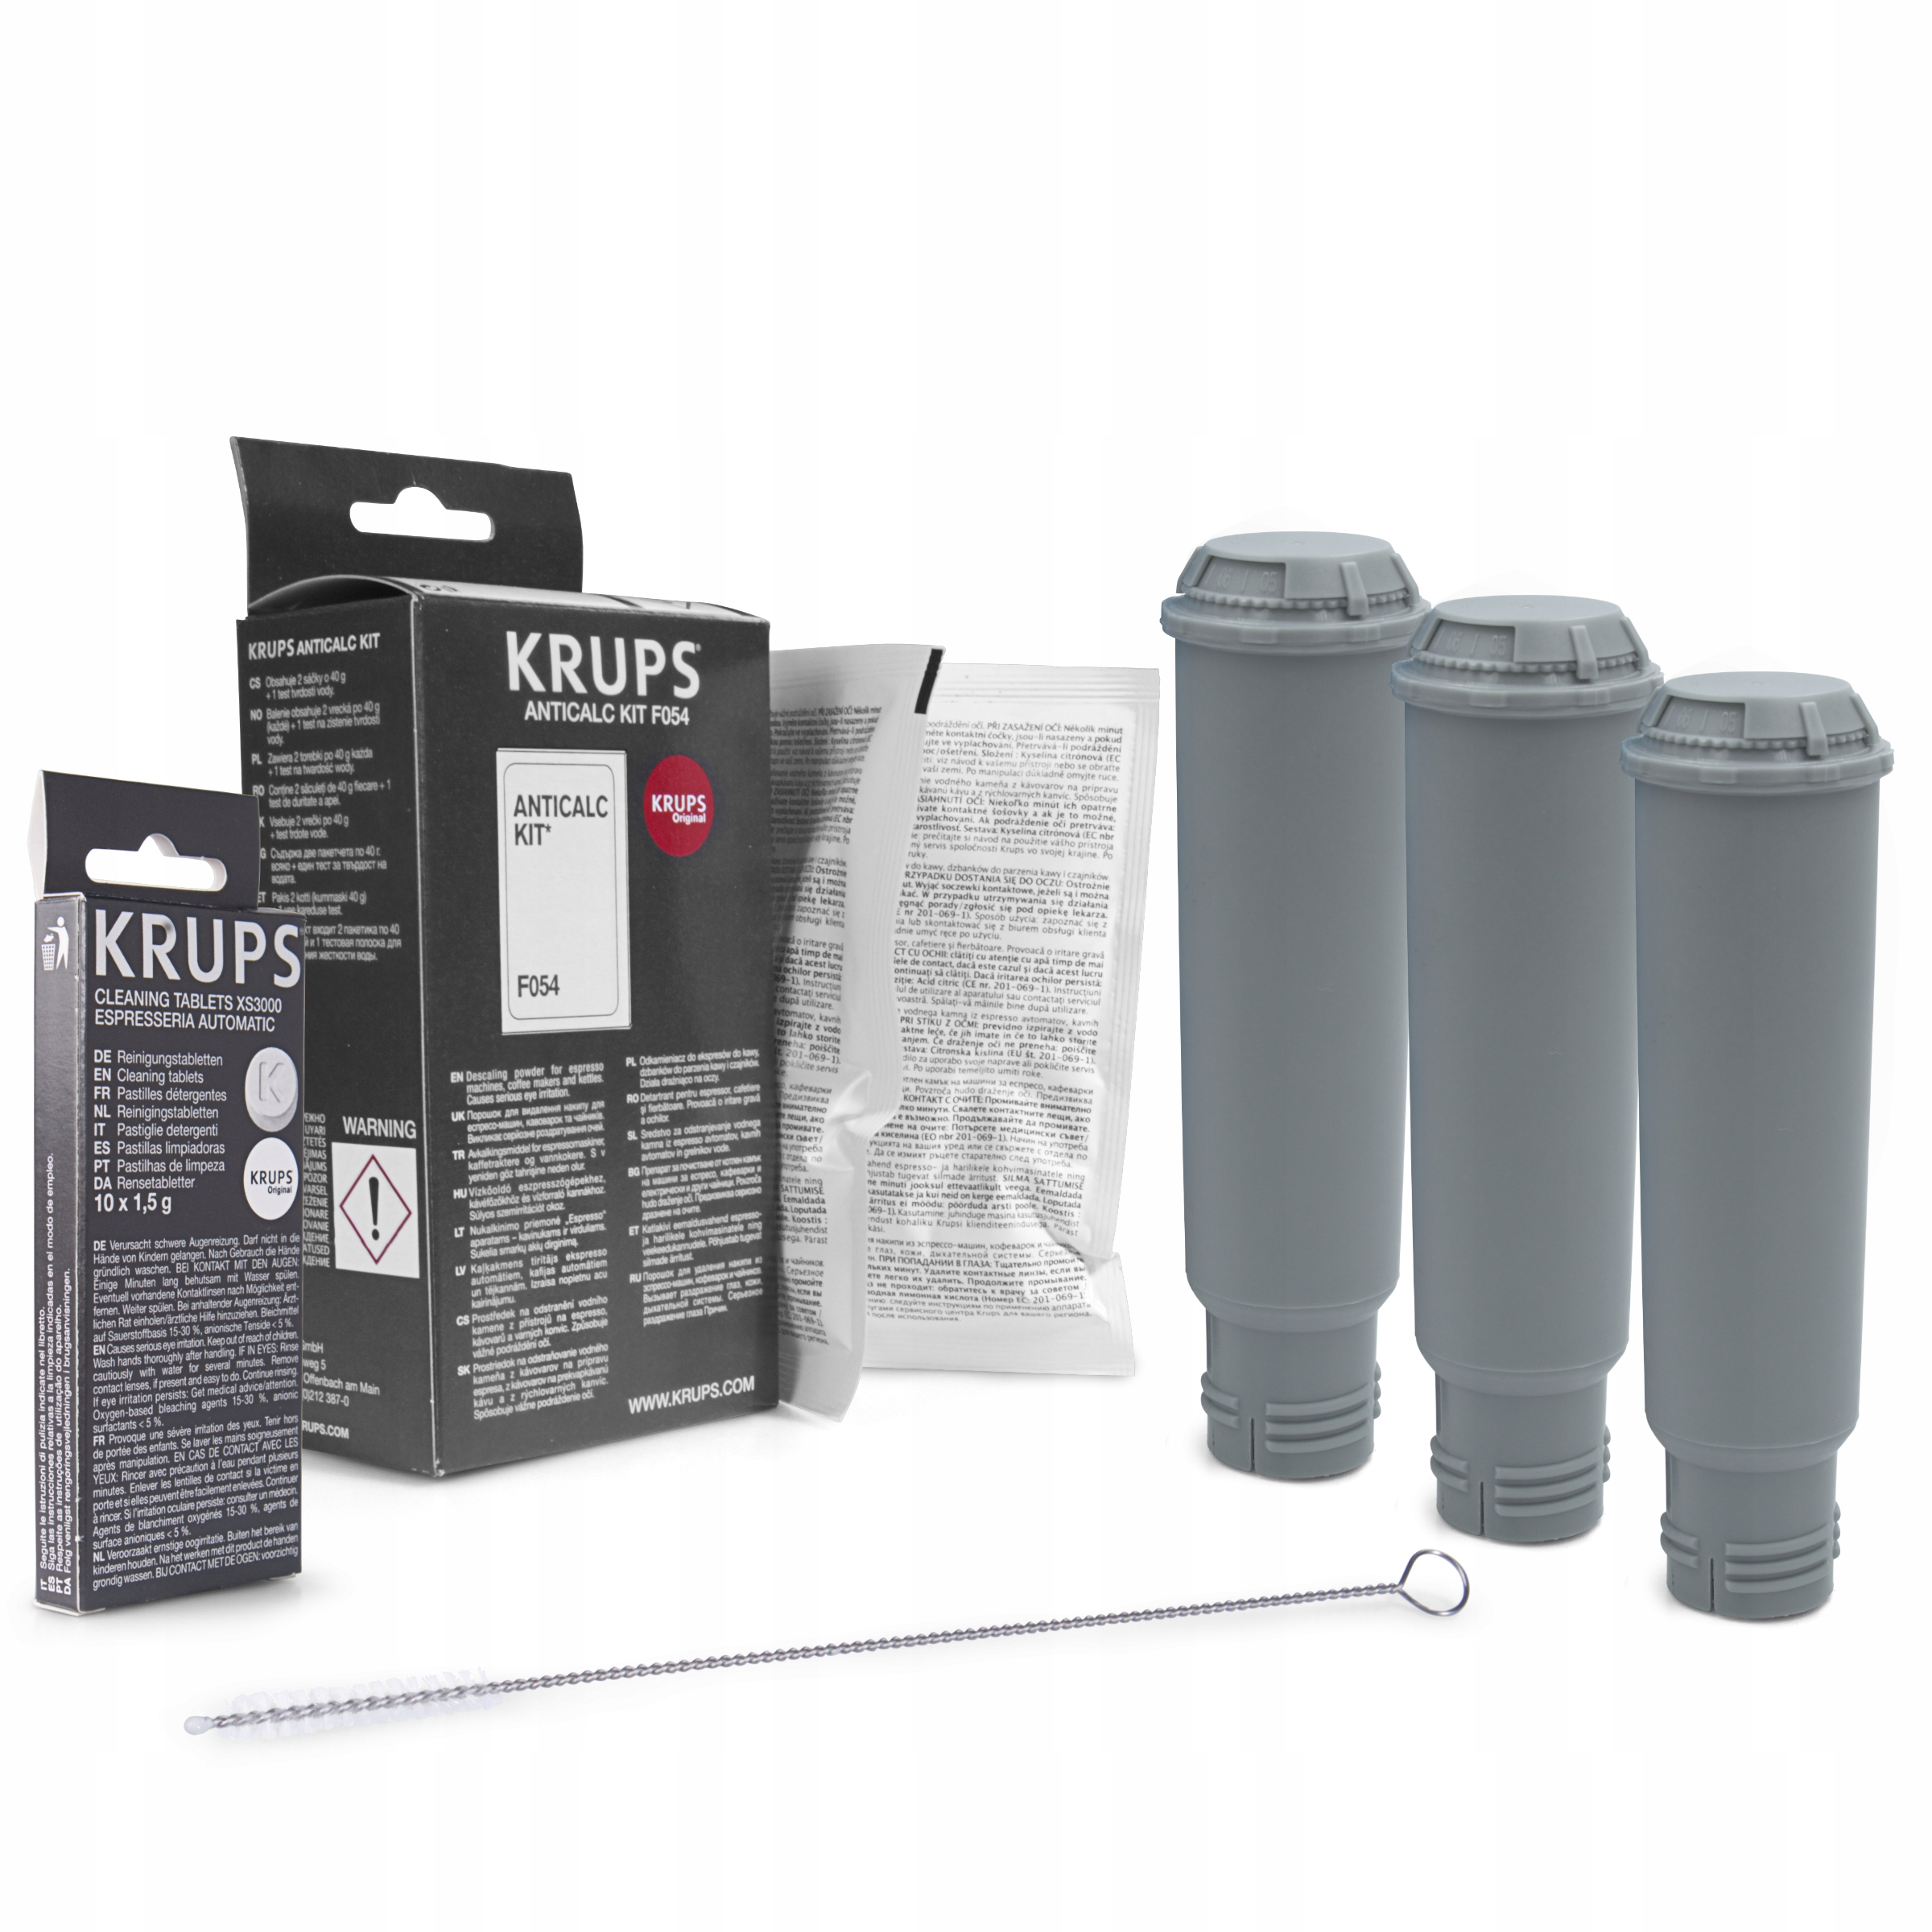 KRUPS XS3000 Очистка таблетки Maker Набор